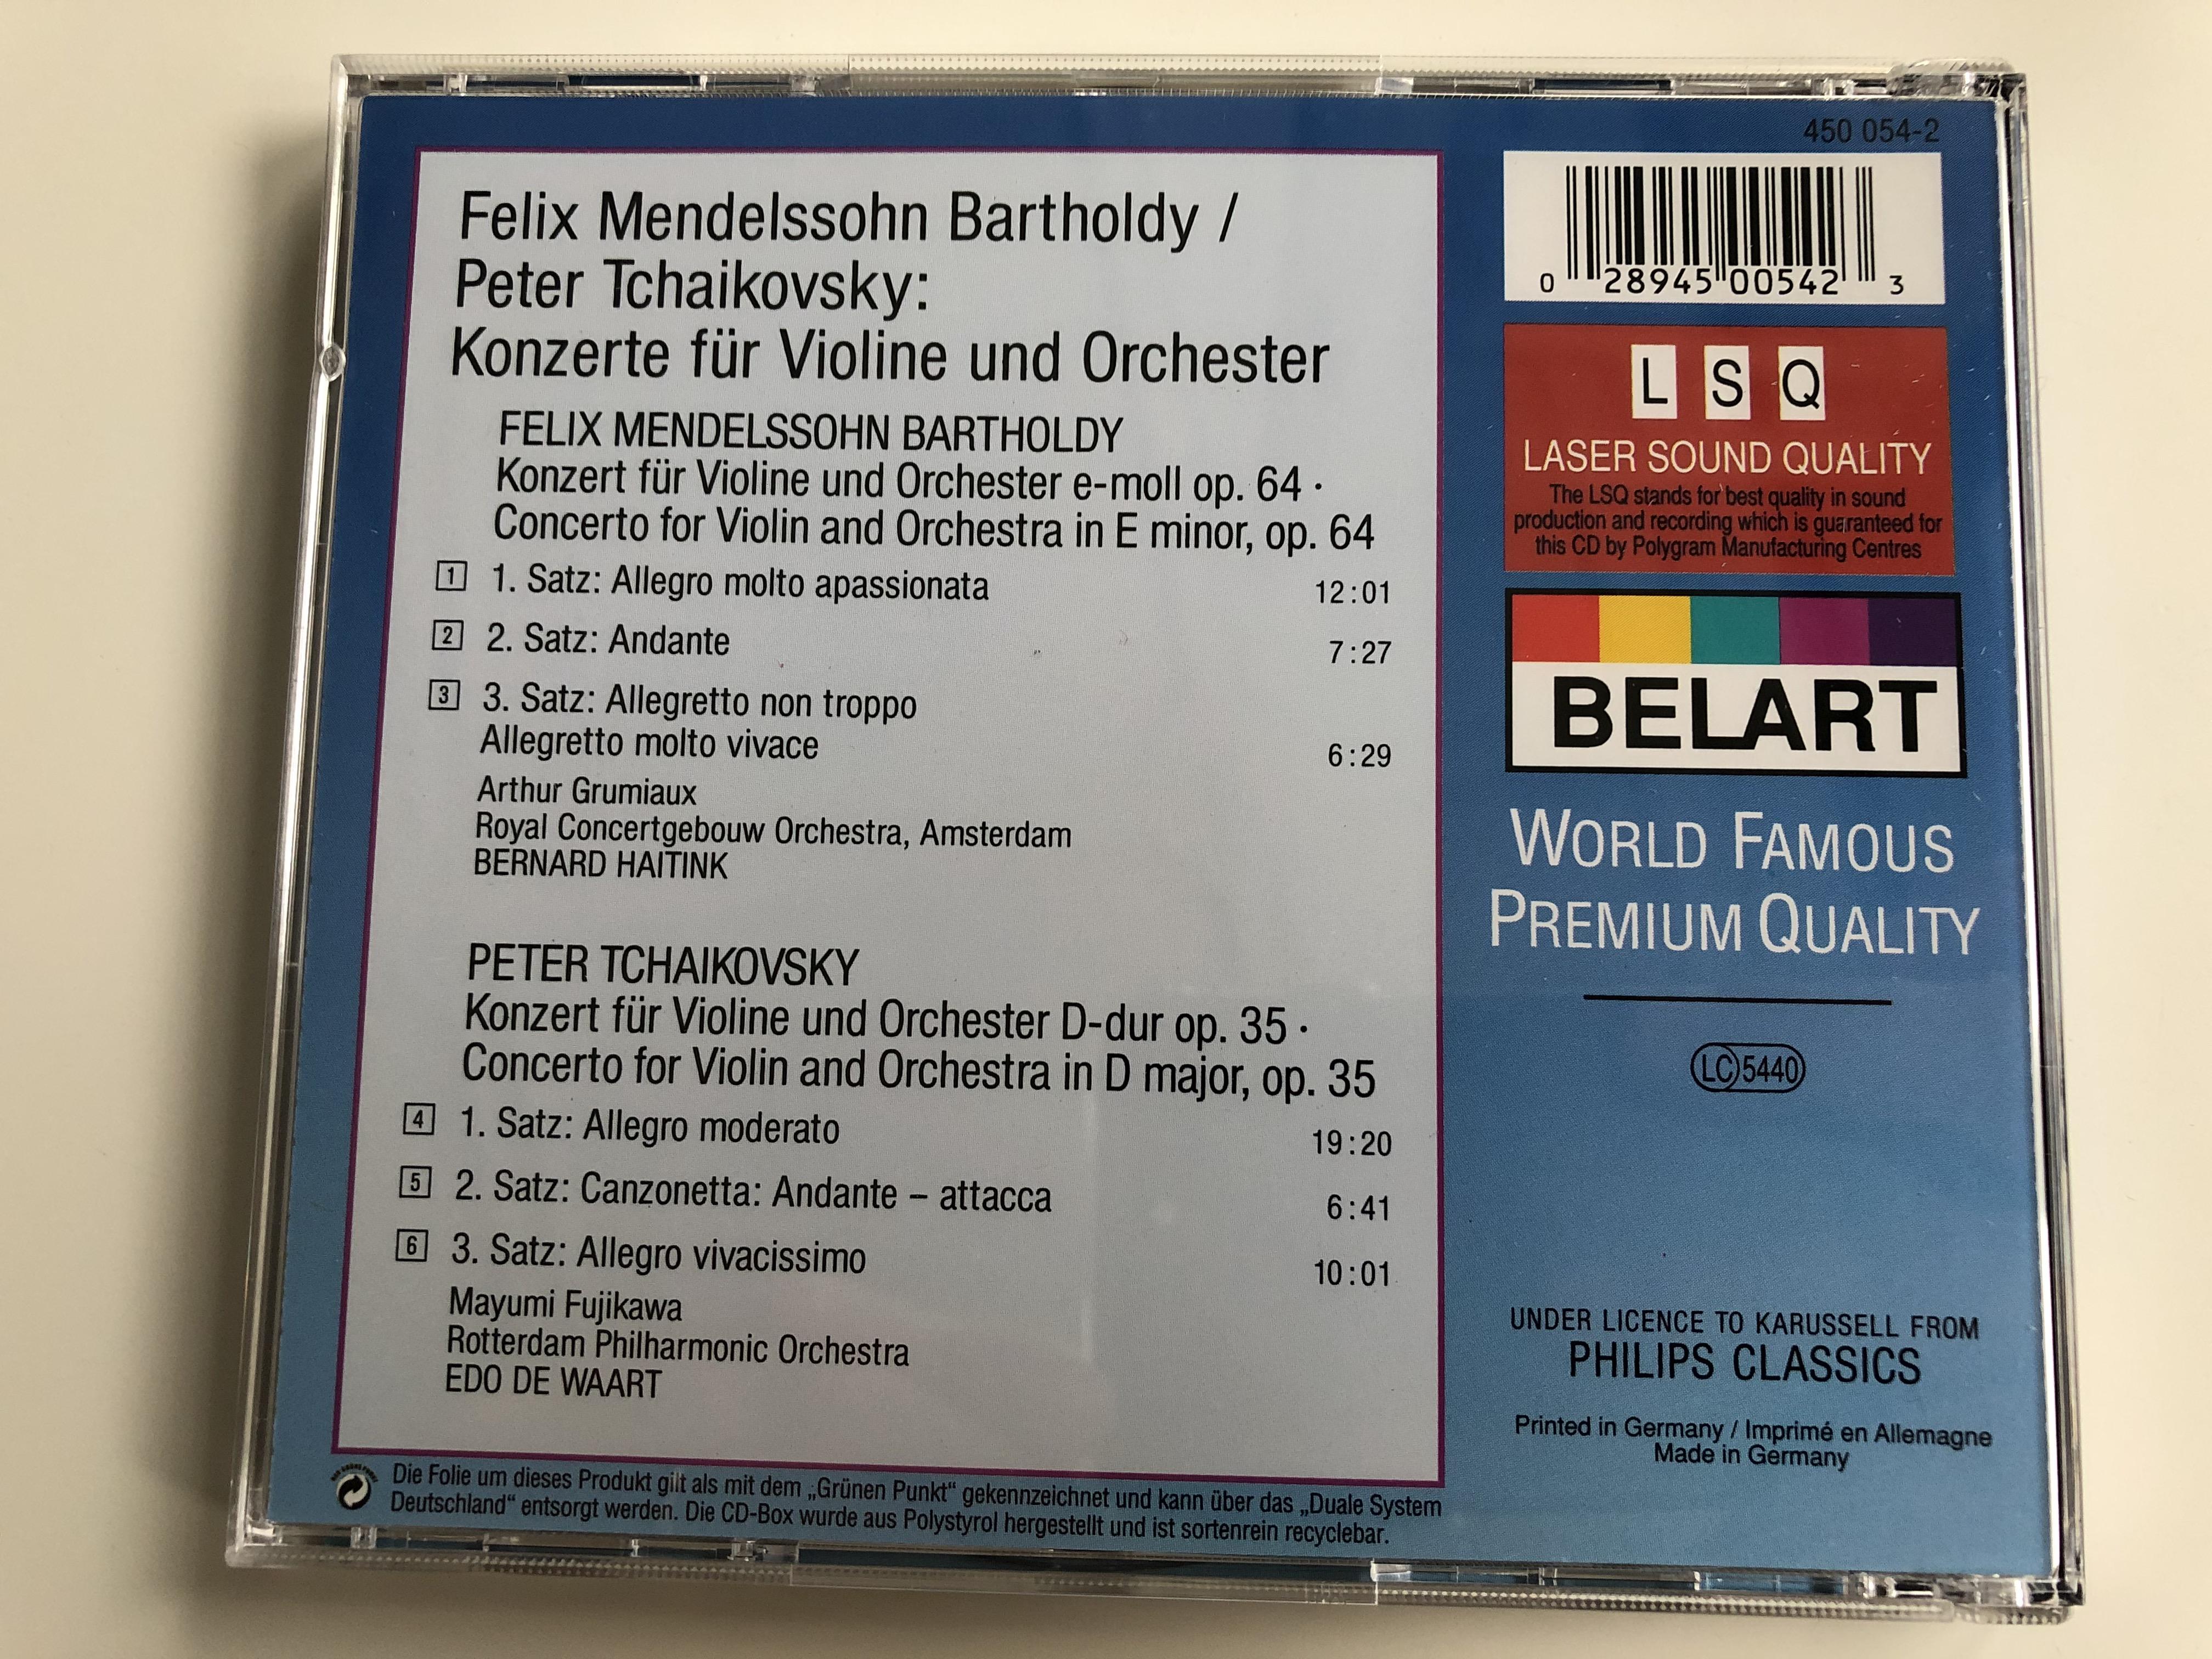 mendelssohn-tchaikovsky-violinkonzerte-violin-concertos-arthur-grumiaux-mayumi-fujikawa-royal-concertgebouw-orchestra-amsterdam-bernard-haitink-belart-audio-cd-stereo-450-054-2-4-.jpg